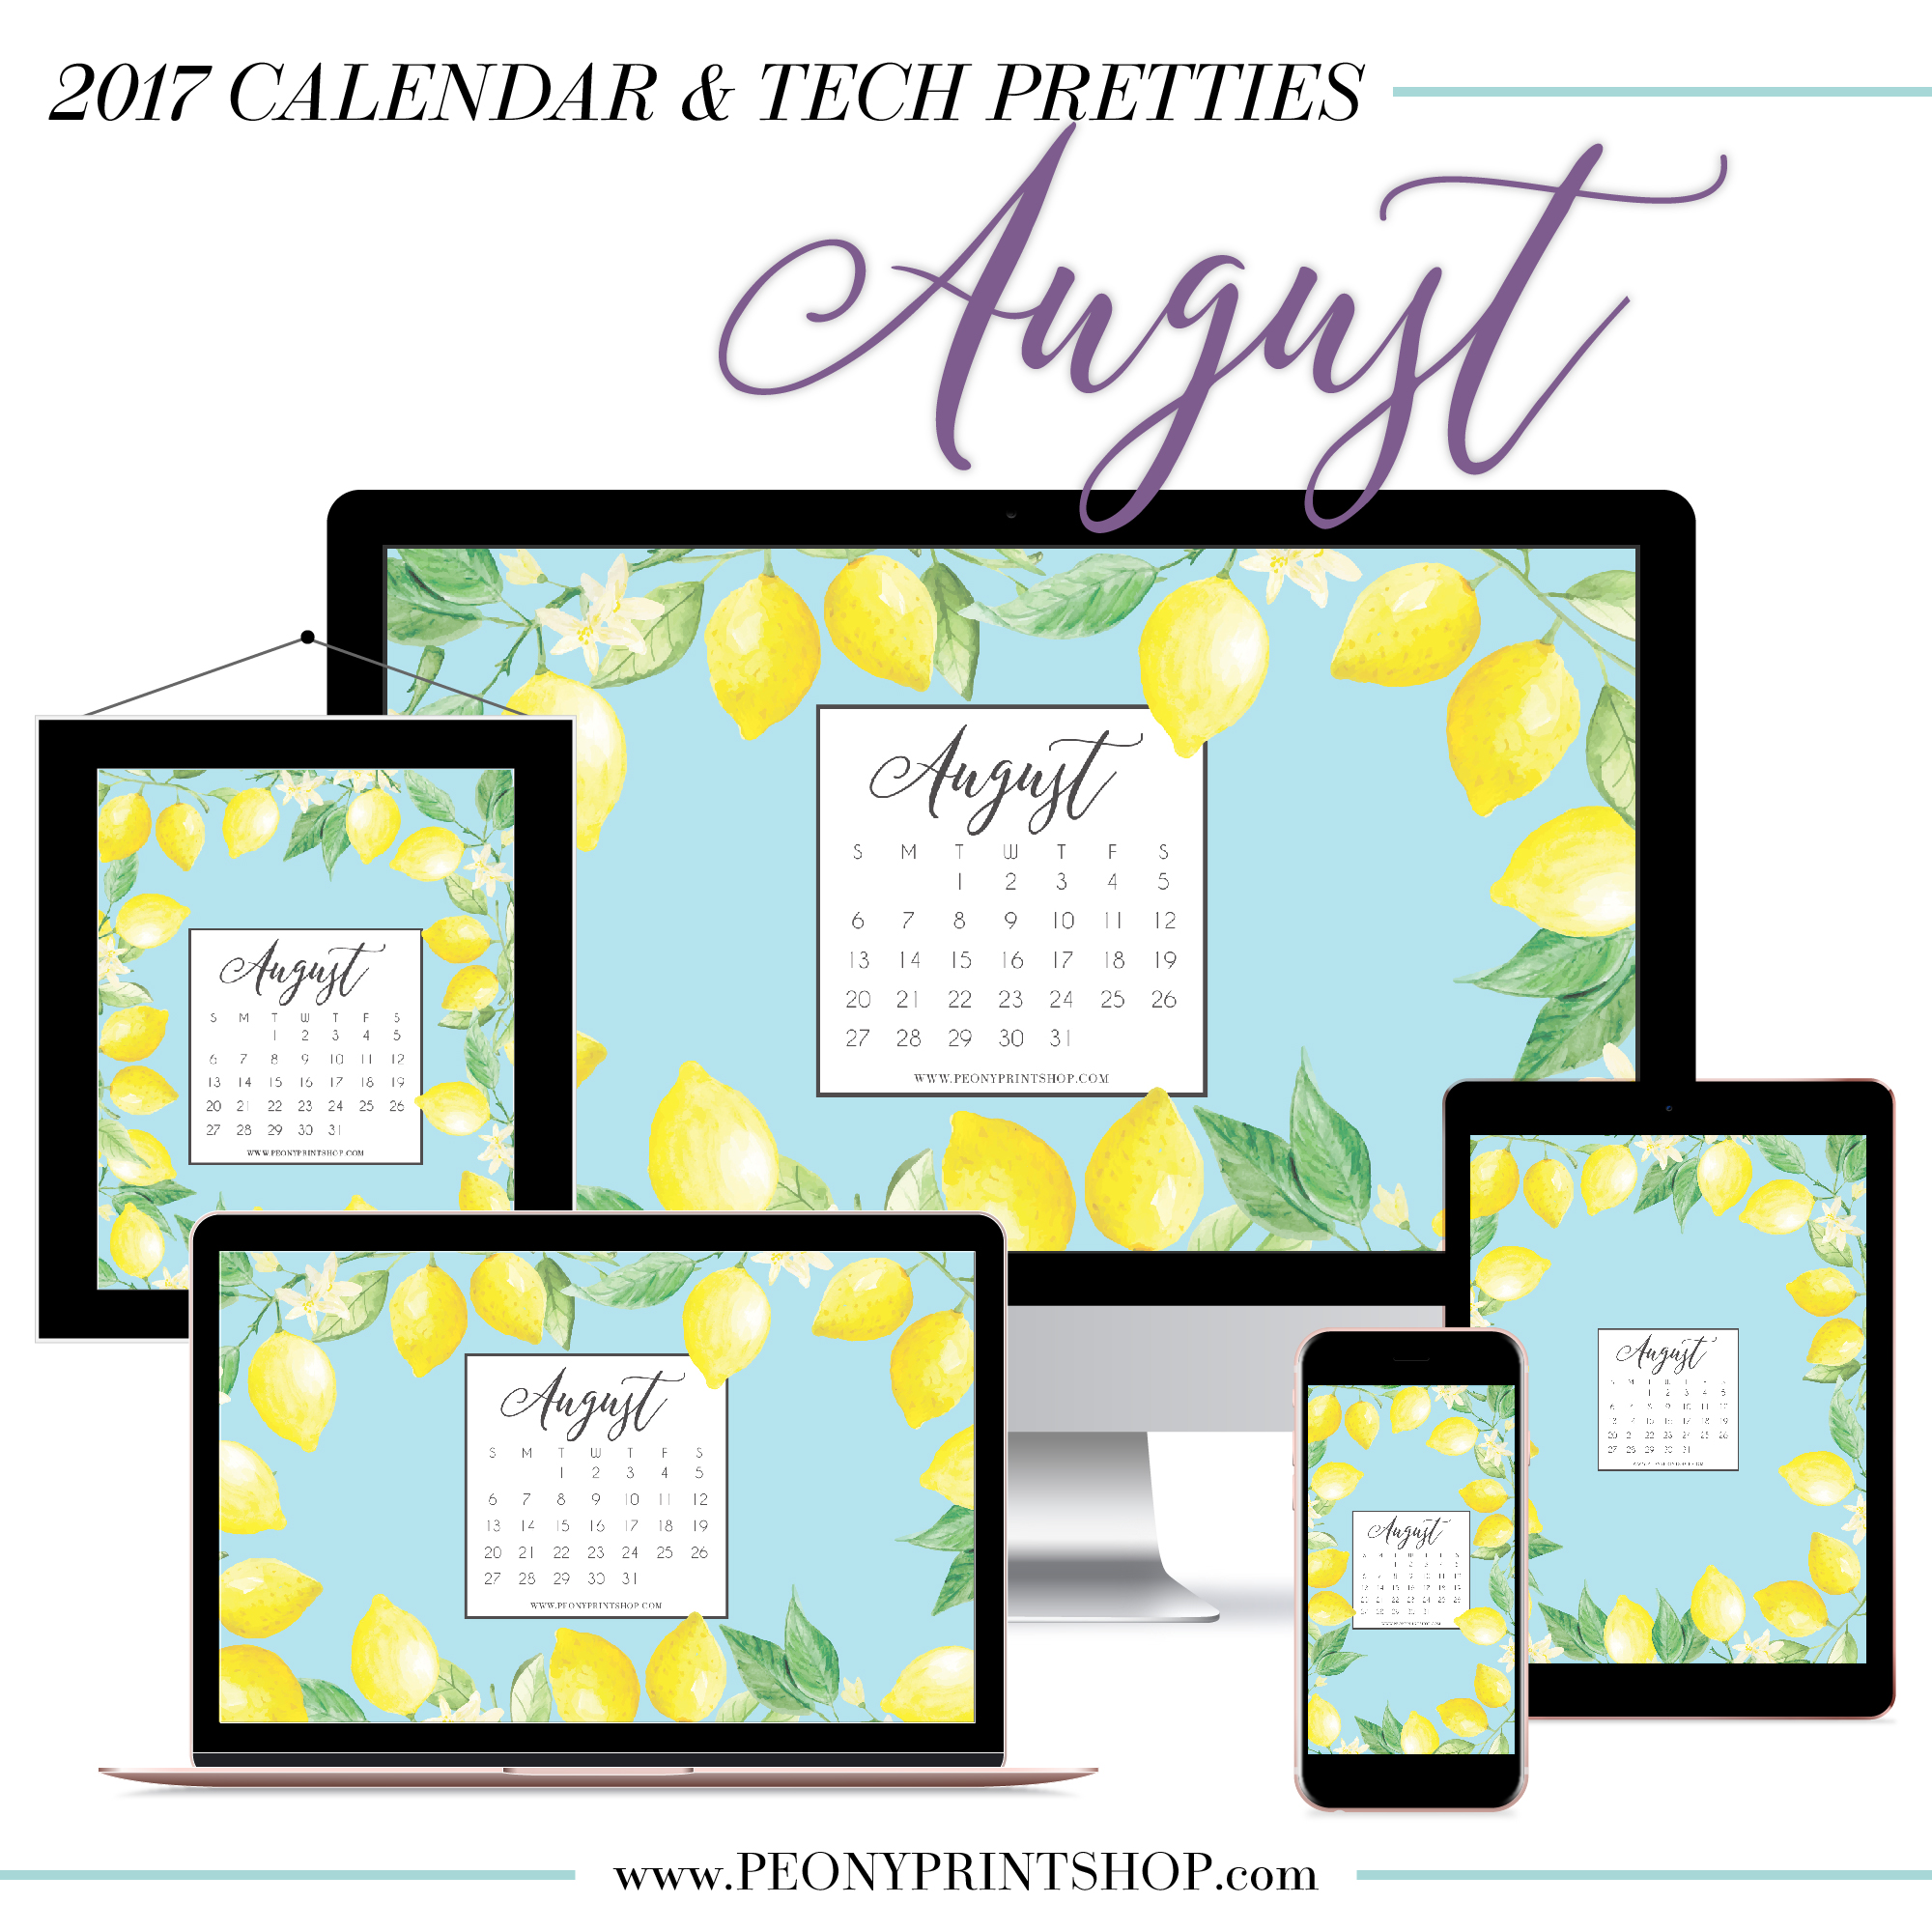 2017 August Calendar + Tech Pretties     PeonyPrintshop.com